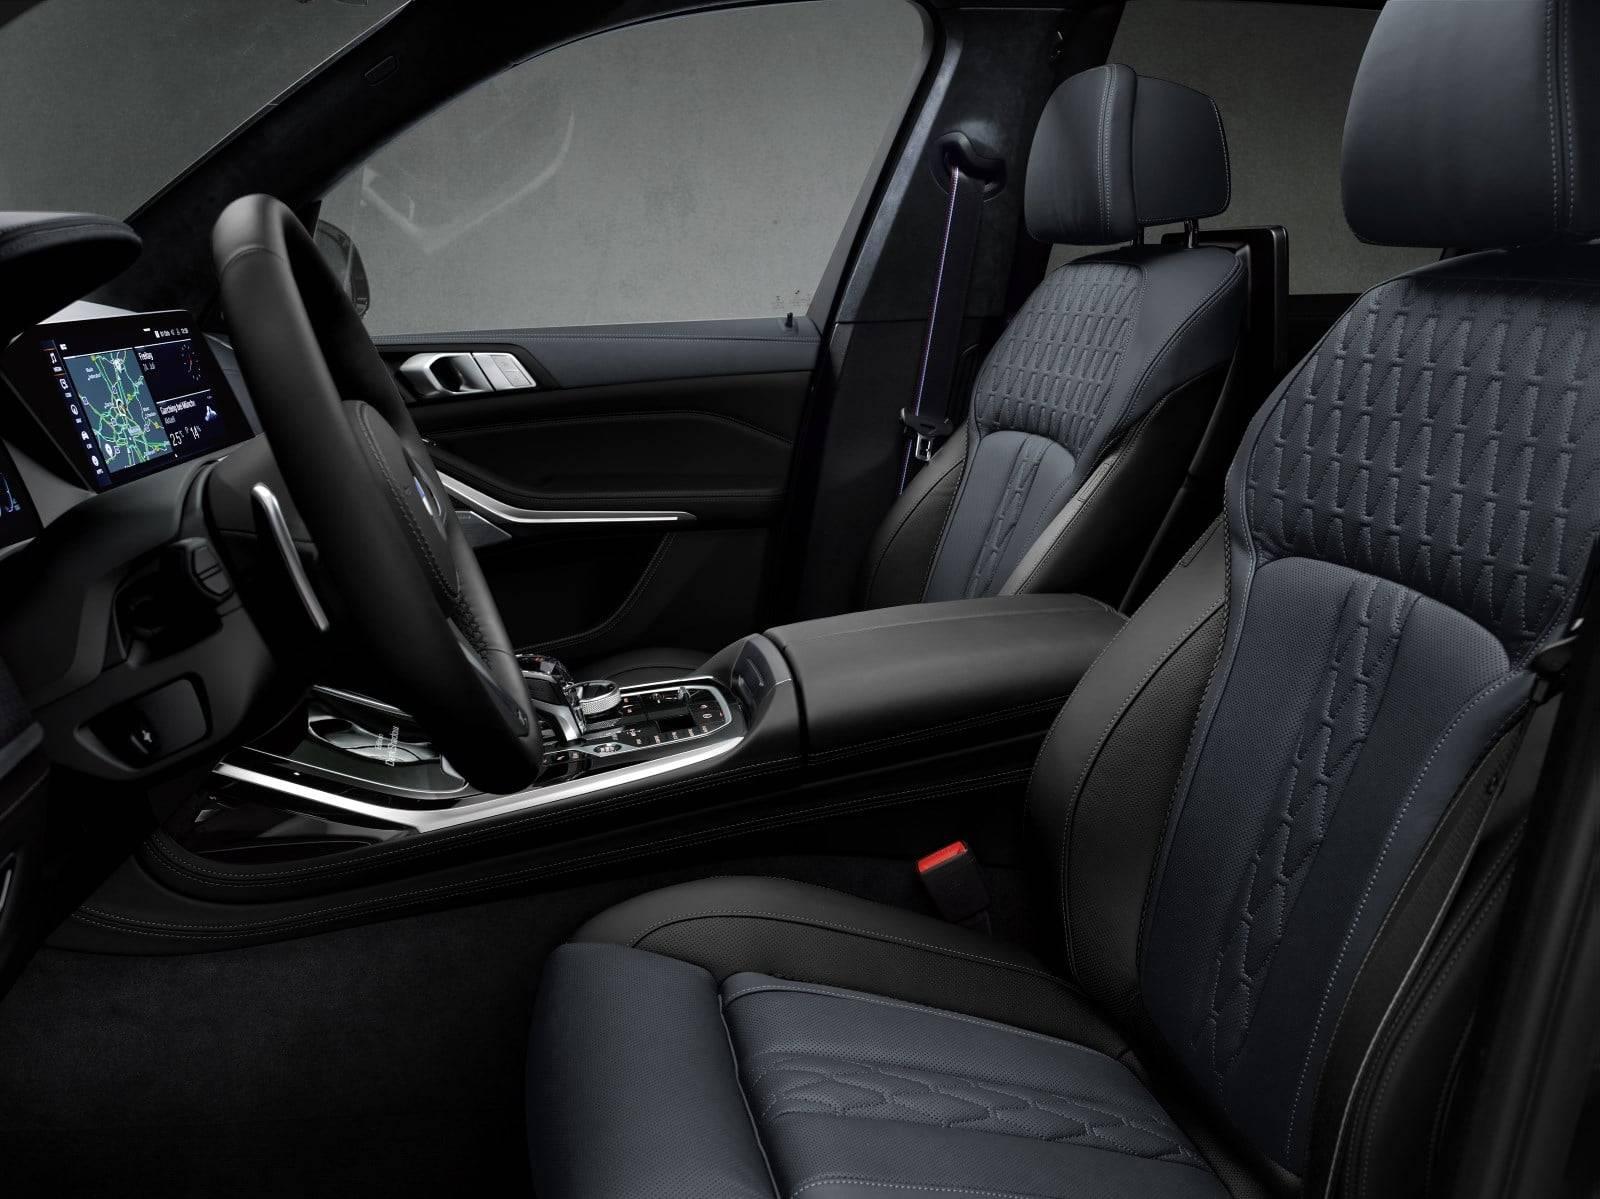 BMW X7 Dark Shadow Edition - впечатляющая харизма 9